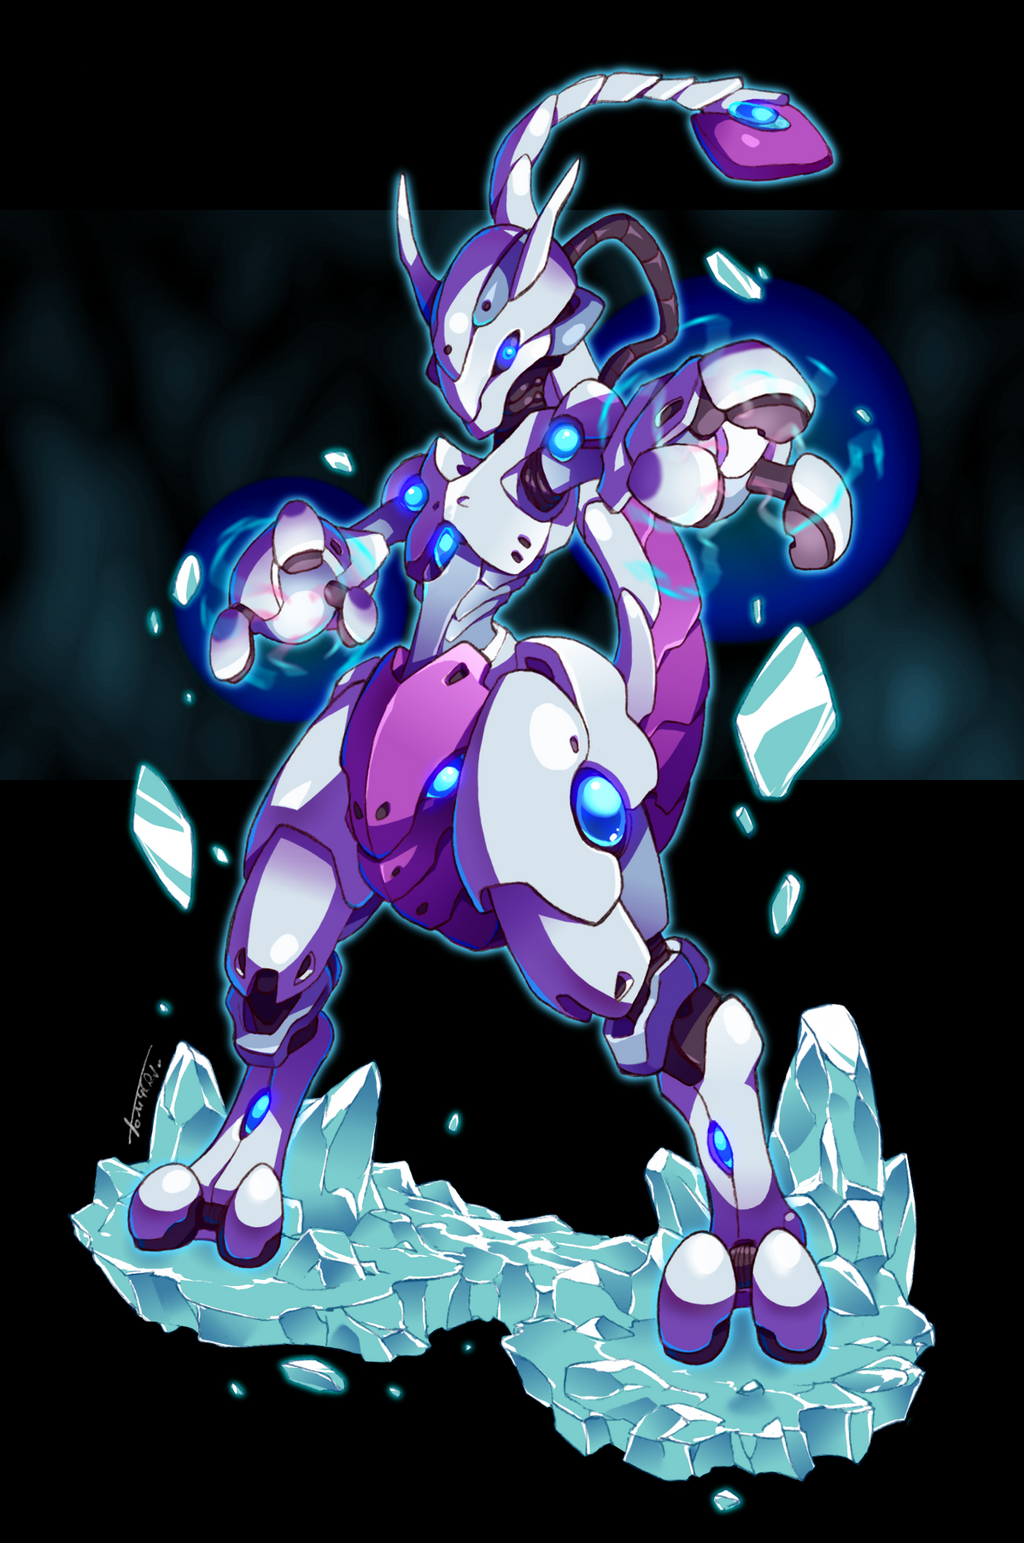 Mecha-Mewtwo by Tomycase on DeviantArt Mecha Mewtwo Sprite